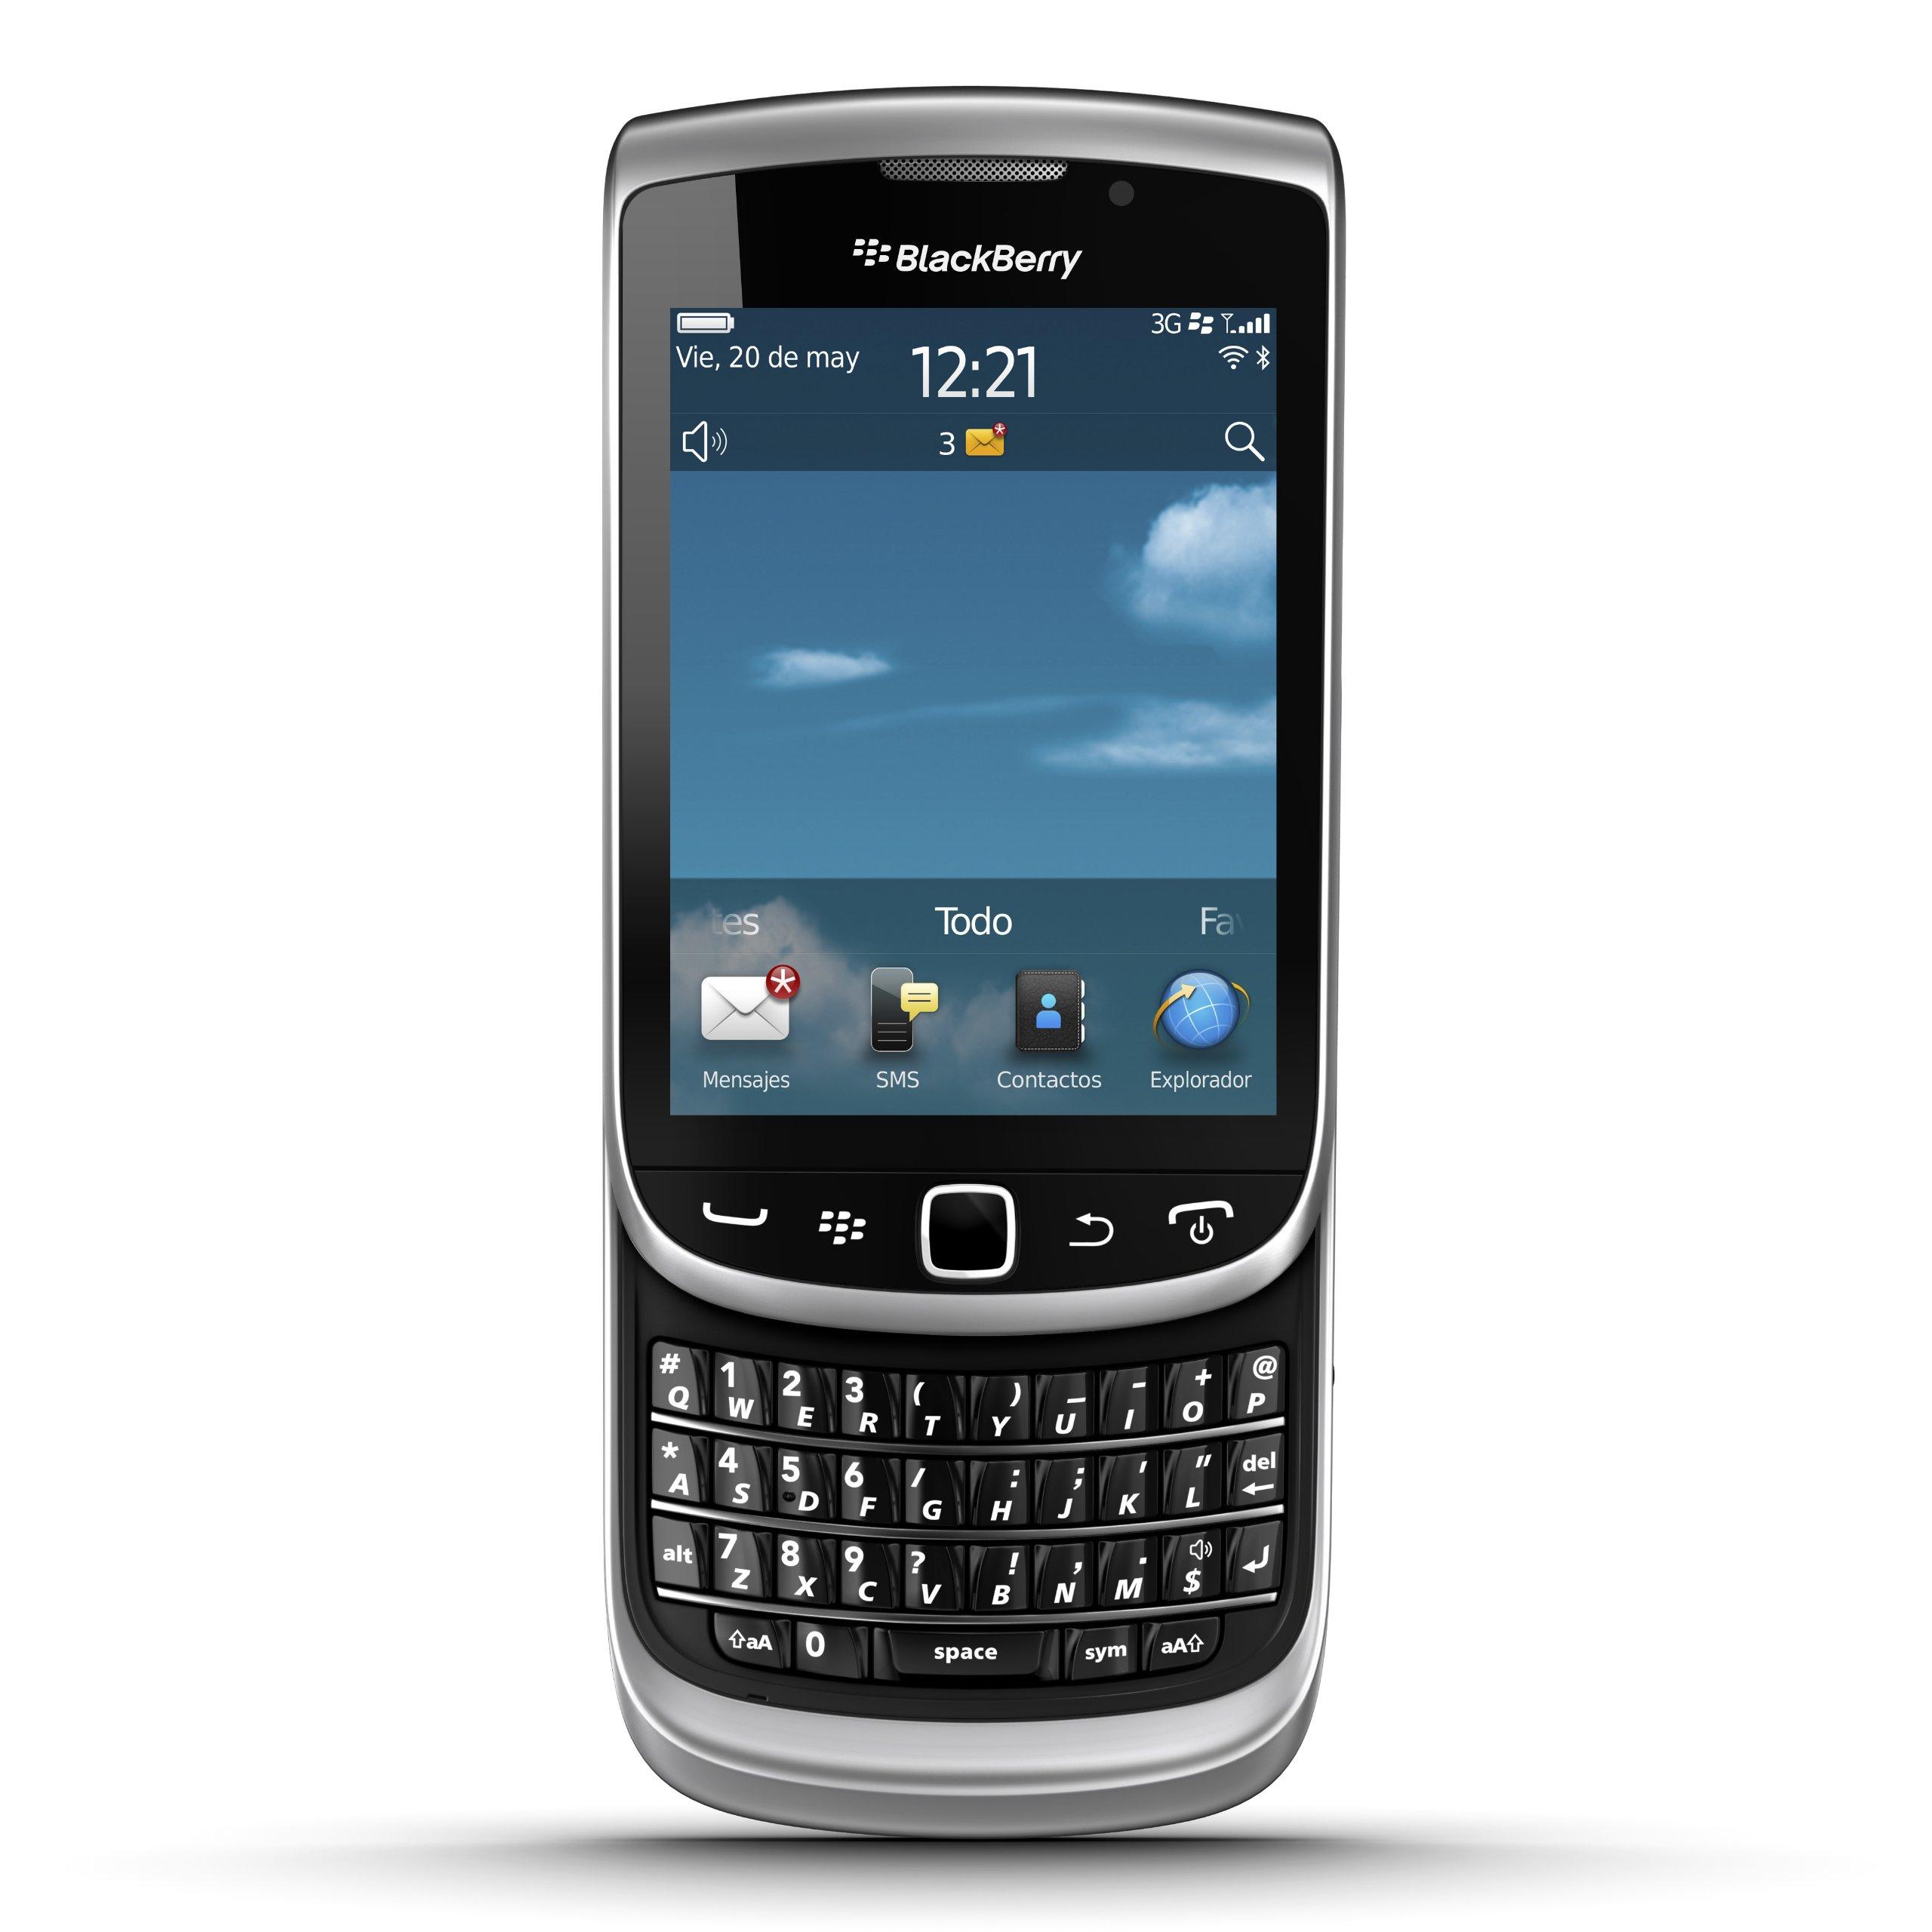 Blackberry Torch 9810 - Smartphone, Pantalla 3.2 Pulgadas, cámara ...